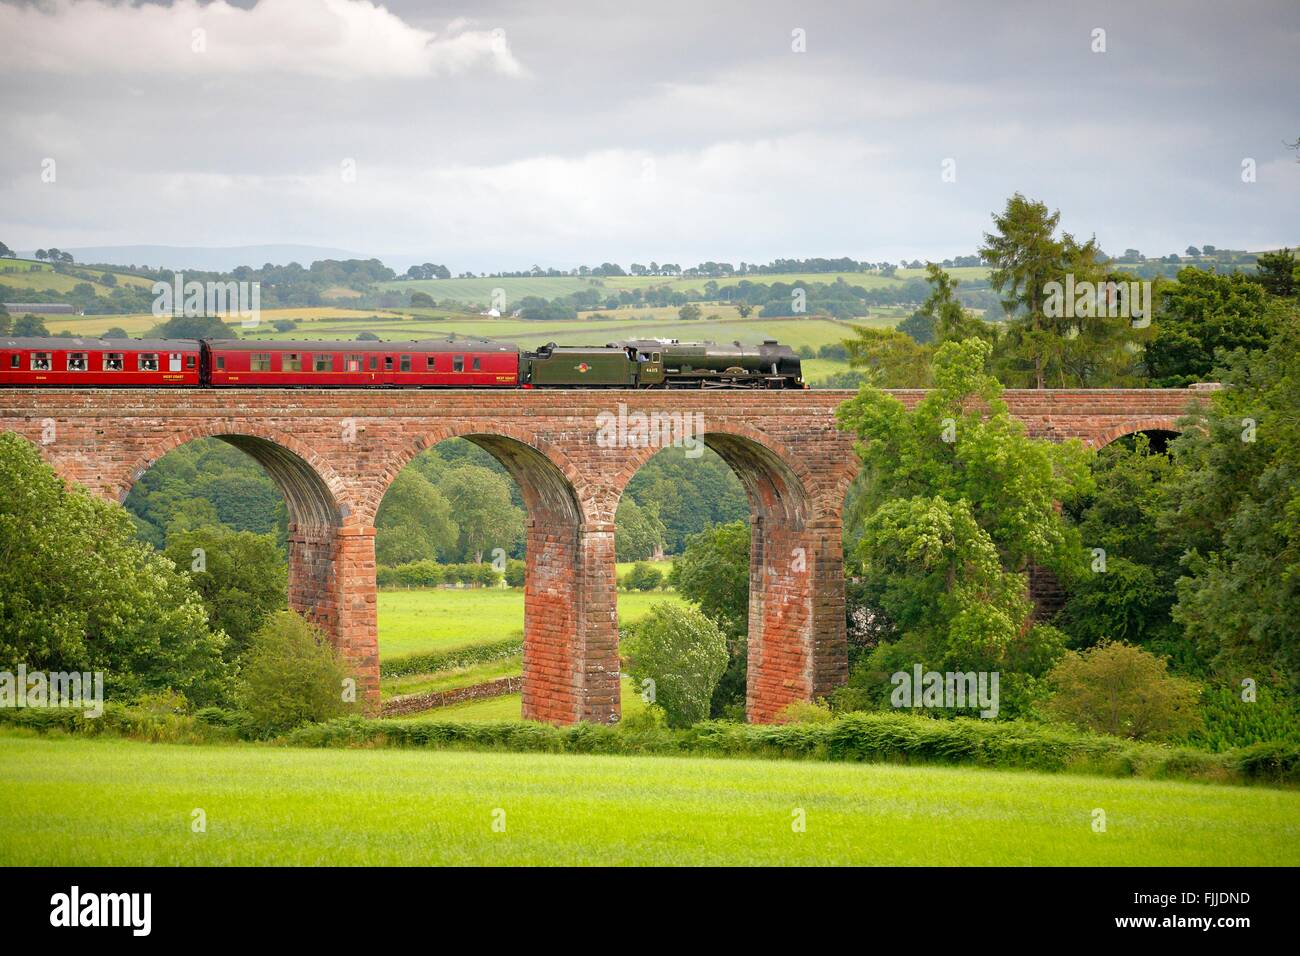 Settle to Carlisle Railway Line. Steam train LMS Royal Scot Class 46115 Scots Guardsman 'The Fellsman', - Stock Image